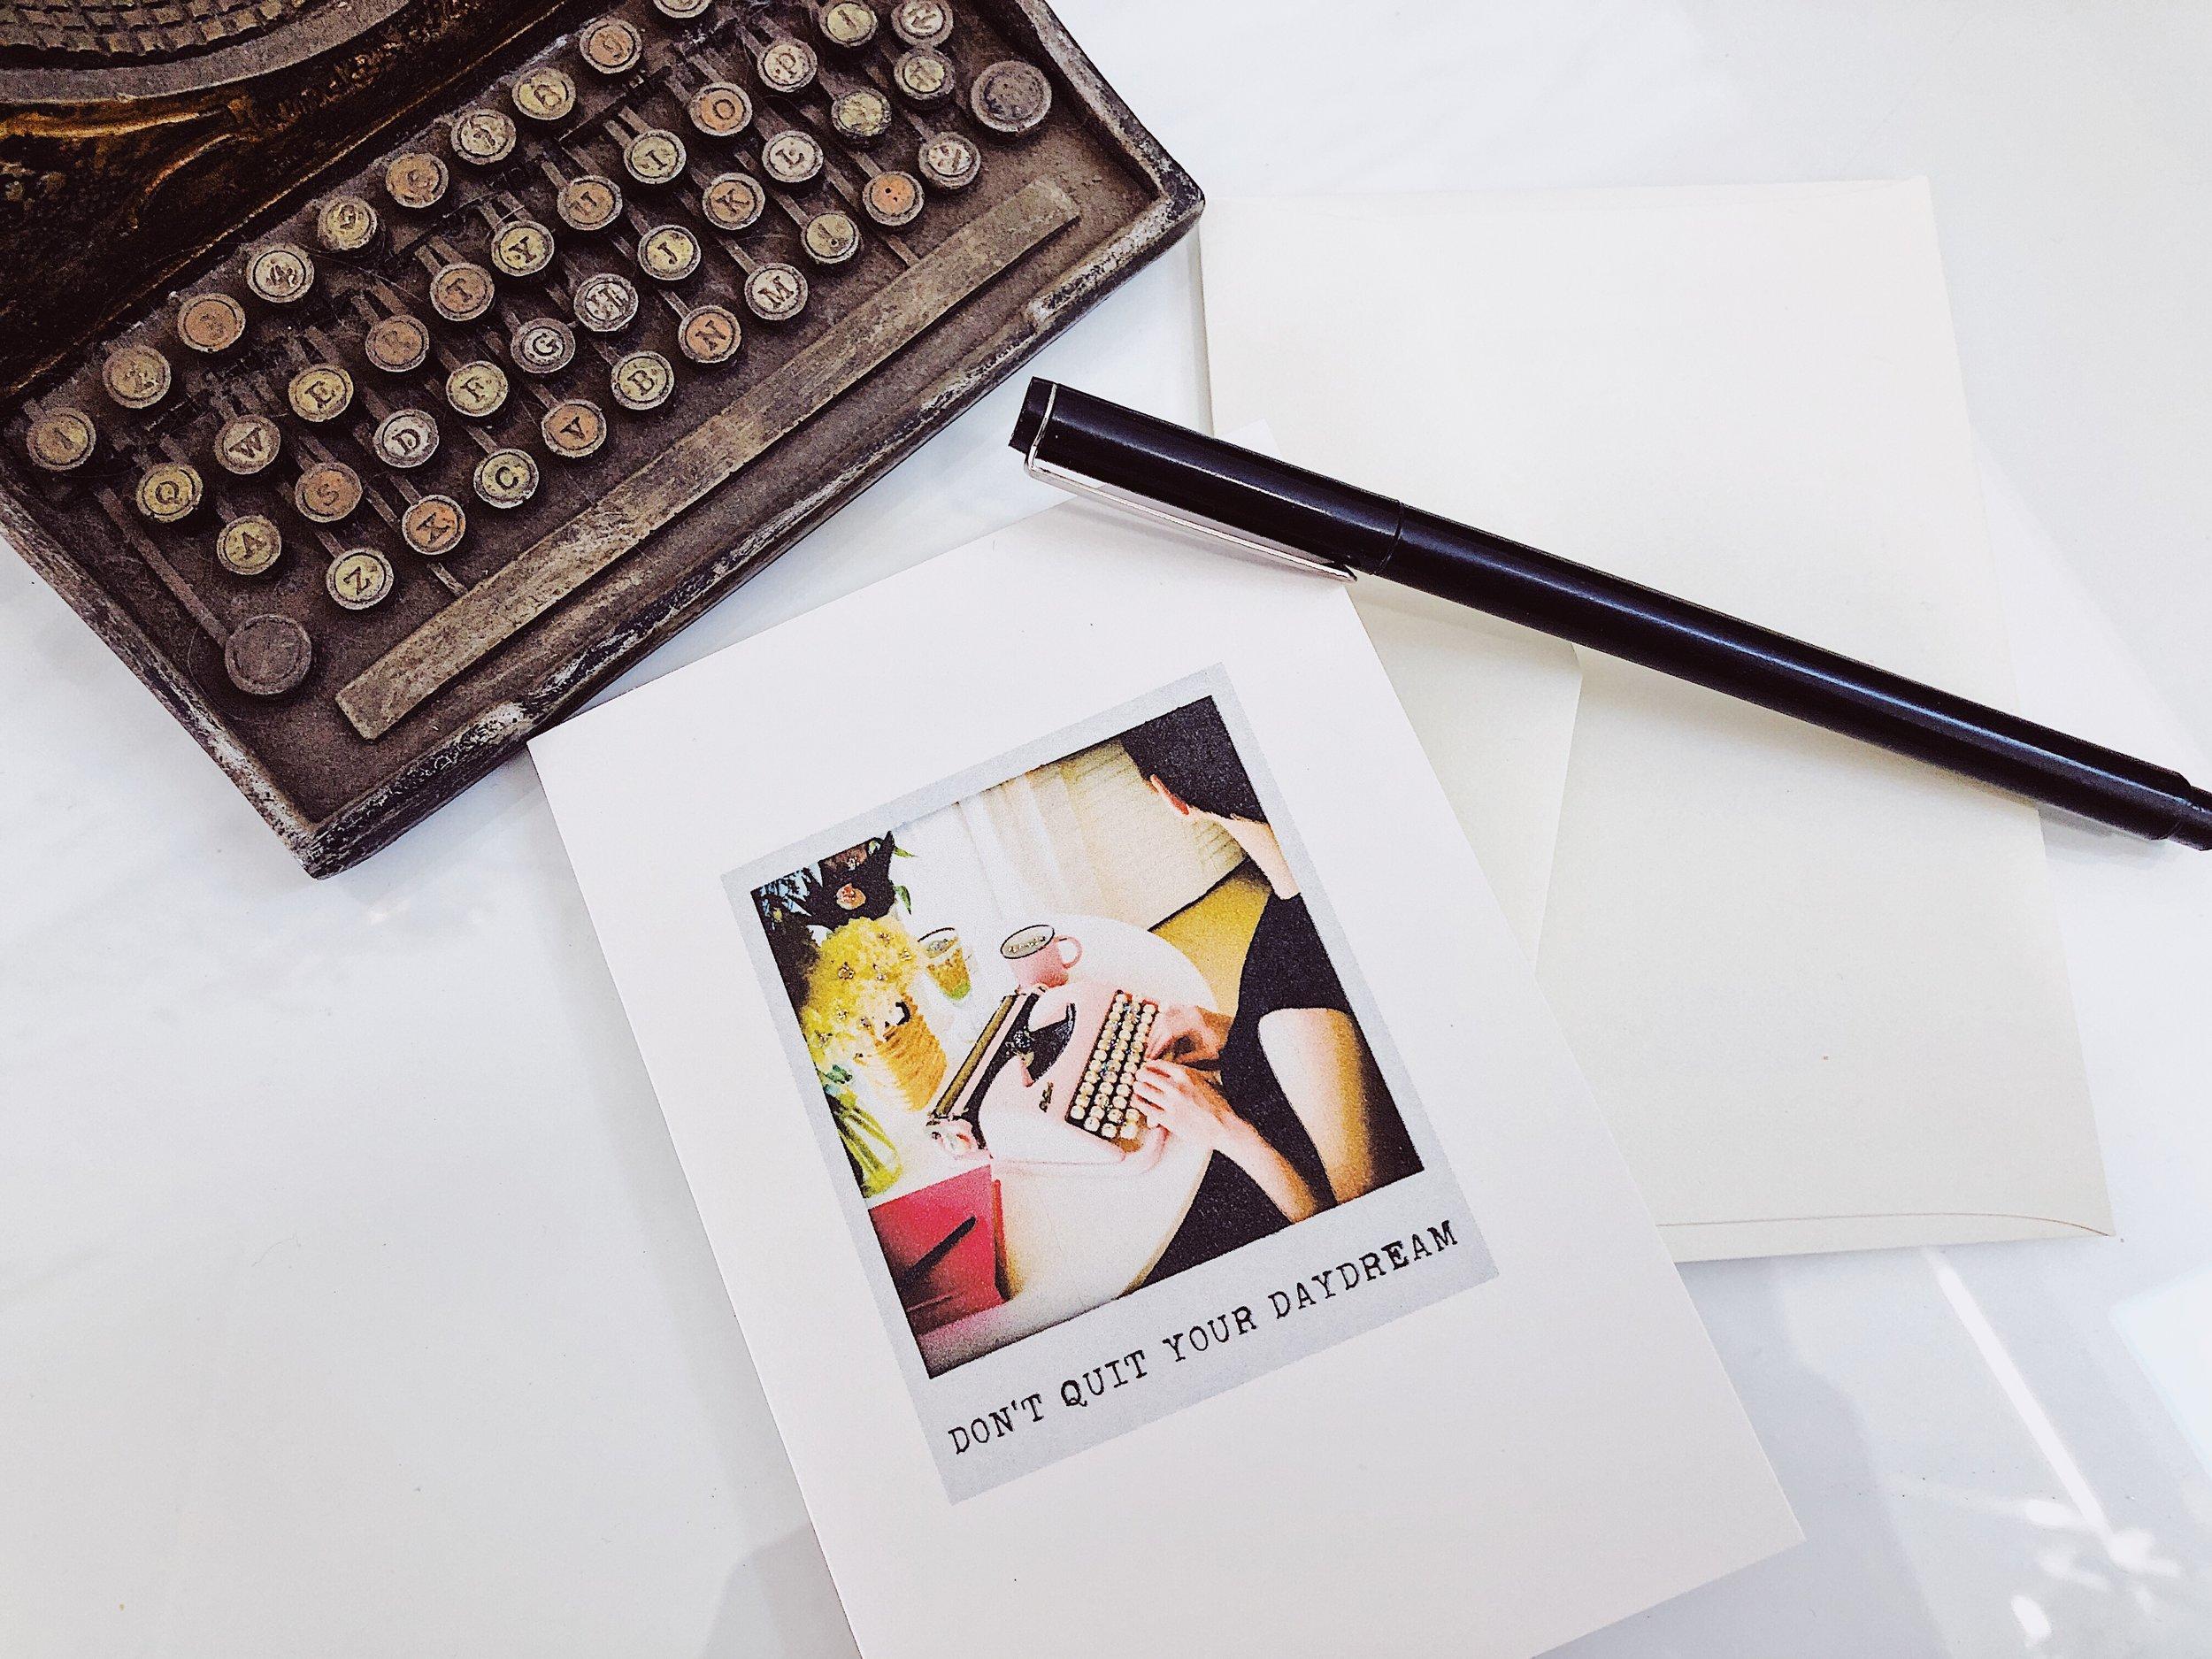 kat-edmonson-sparkle-and-shine-card-set-typewriter-styled.JPG